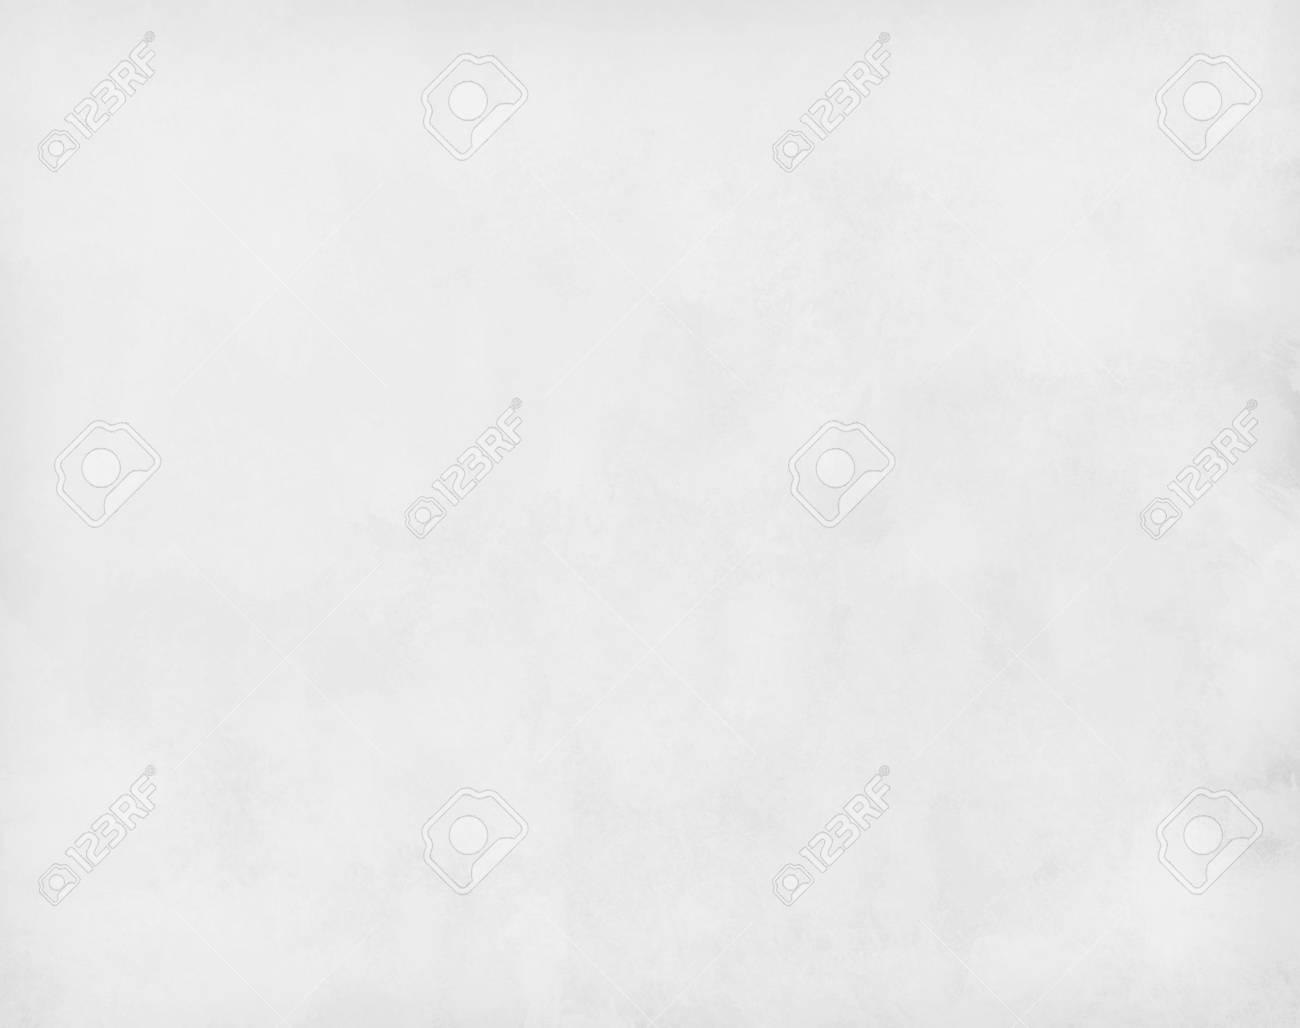 Frost White Background Black Light Vintage Grunge Background